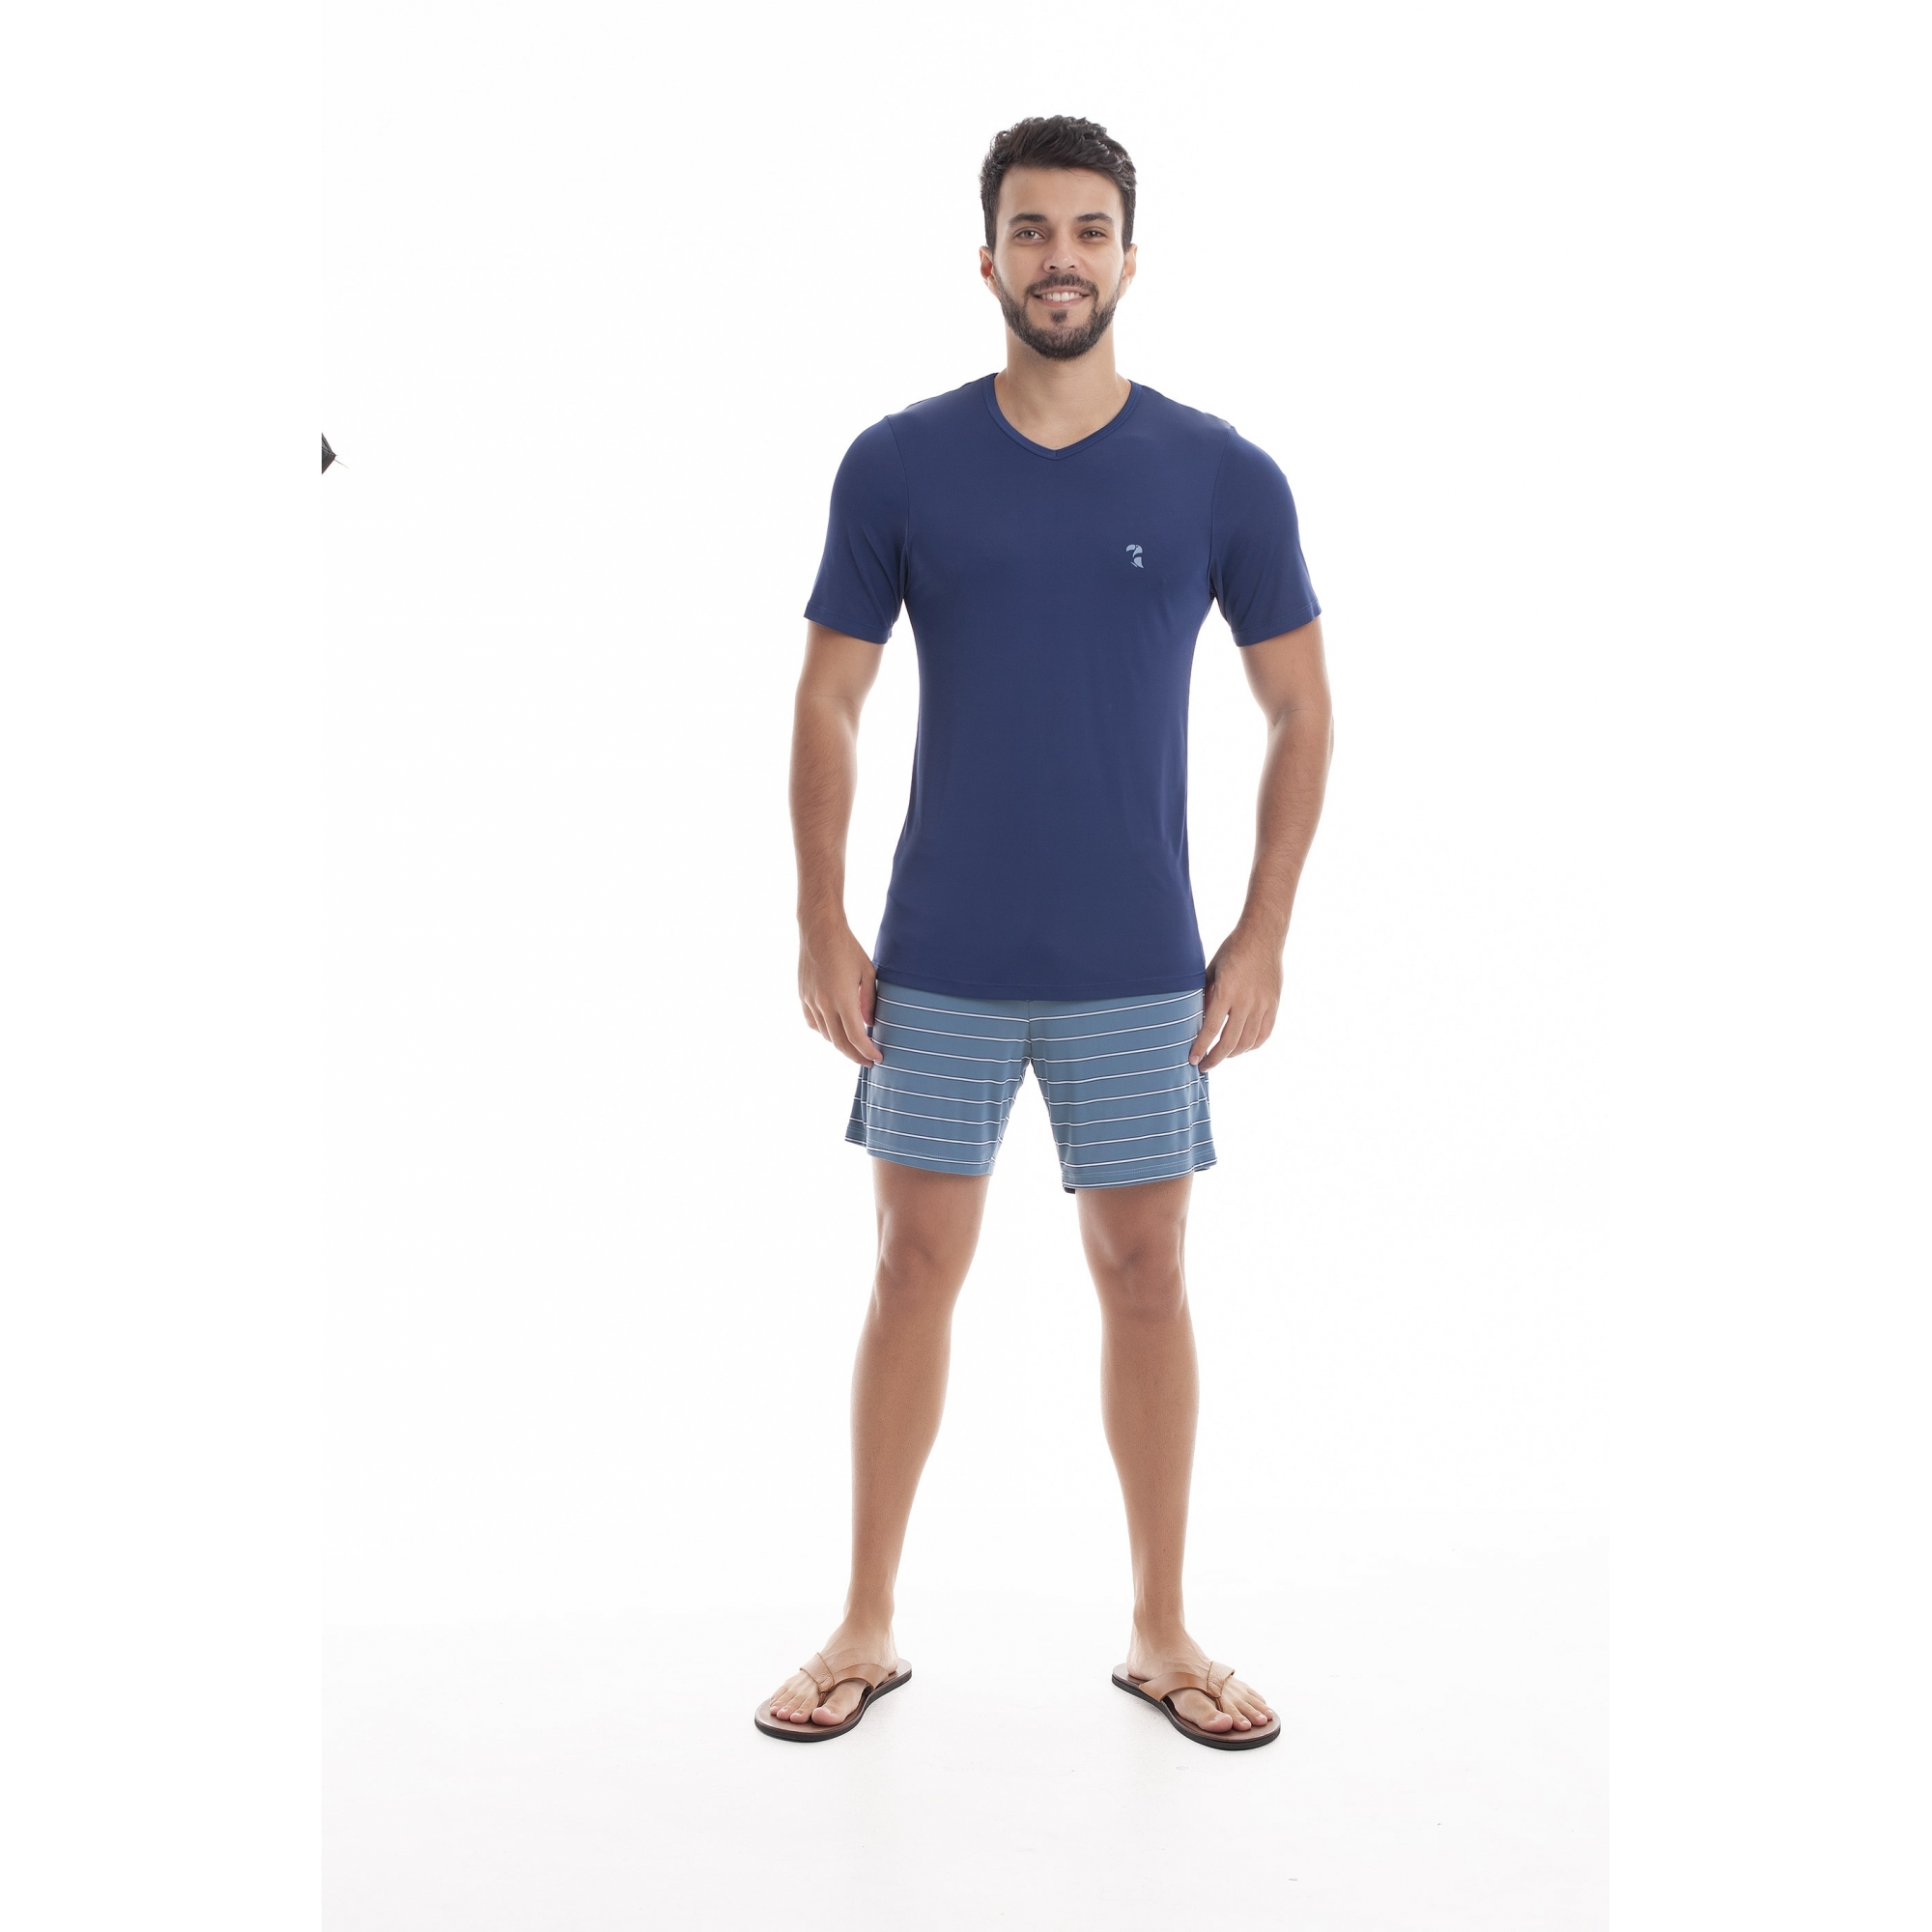 Pijama Masculino Adulto Paulienne Marinho com listras em Liganete 09665B46